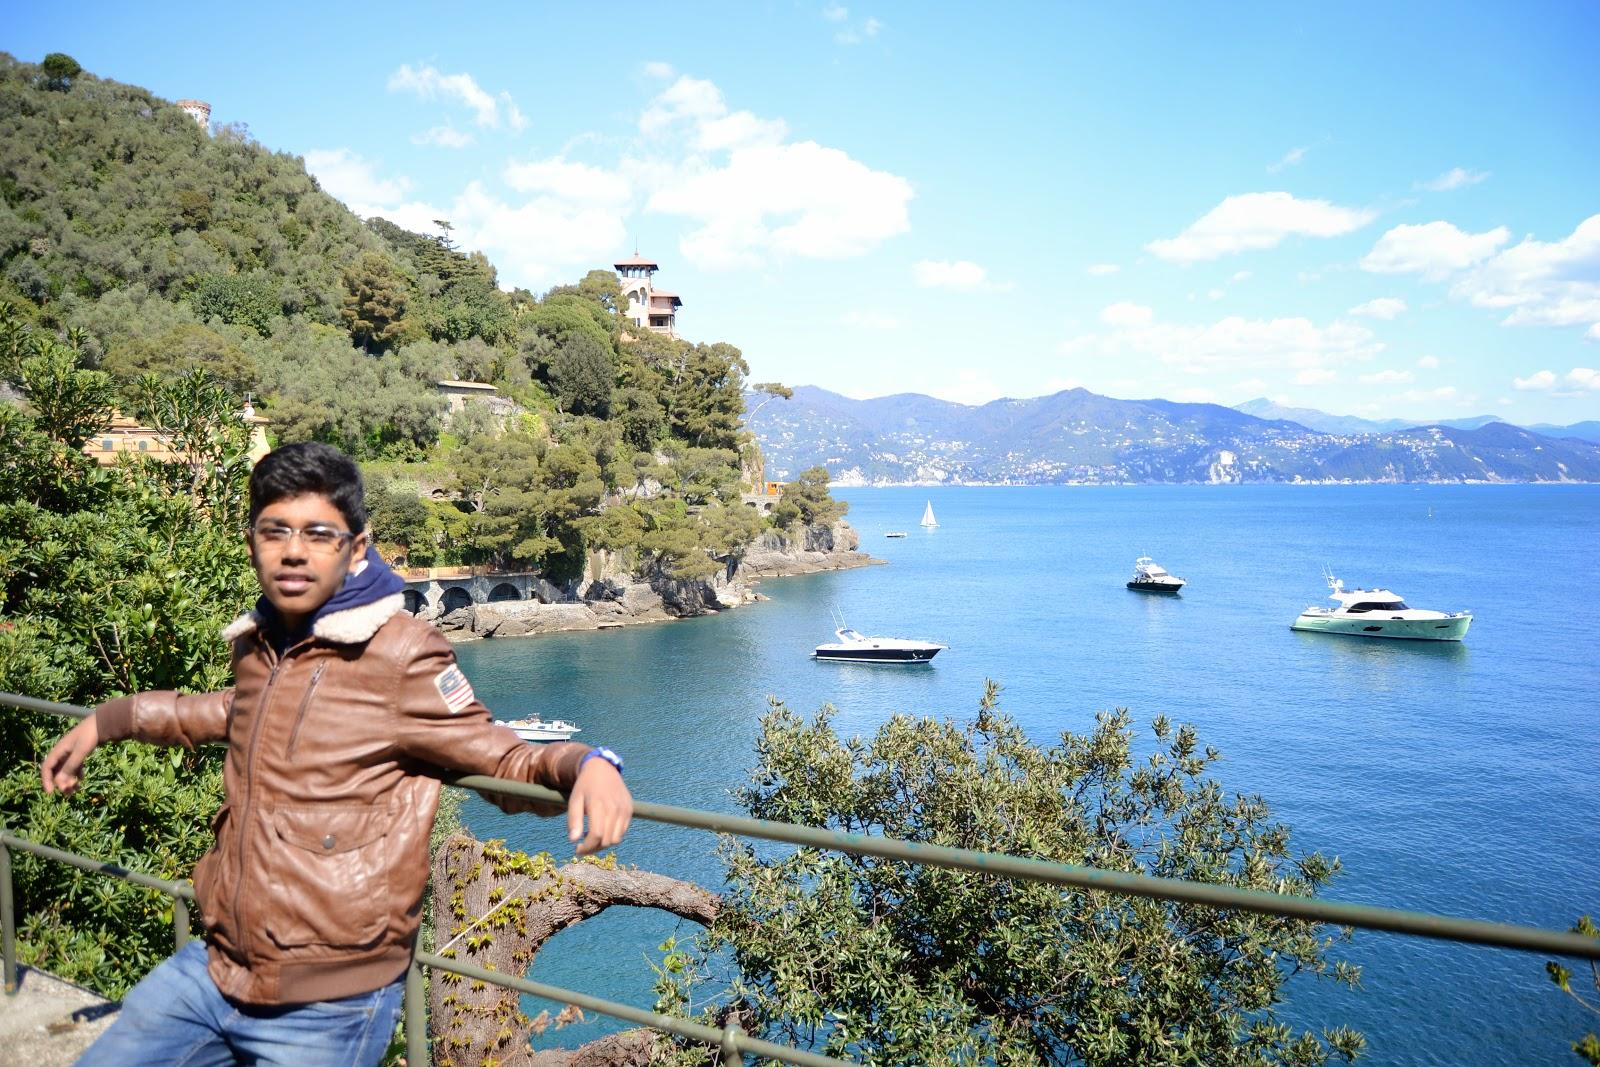 Kiran Jothi @ Portofino